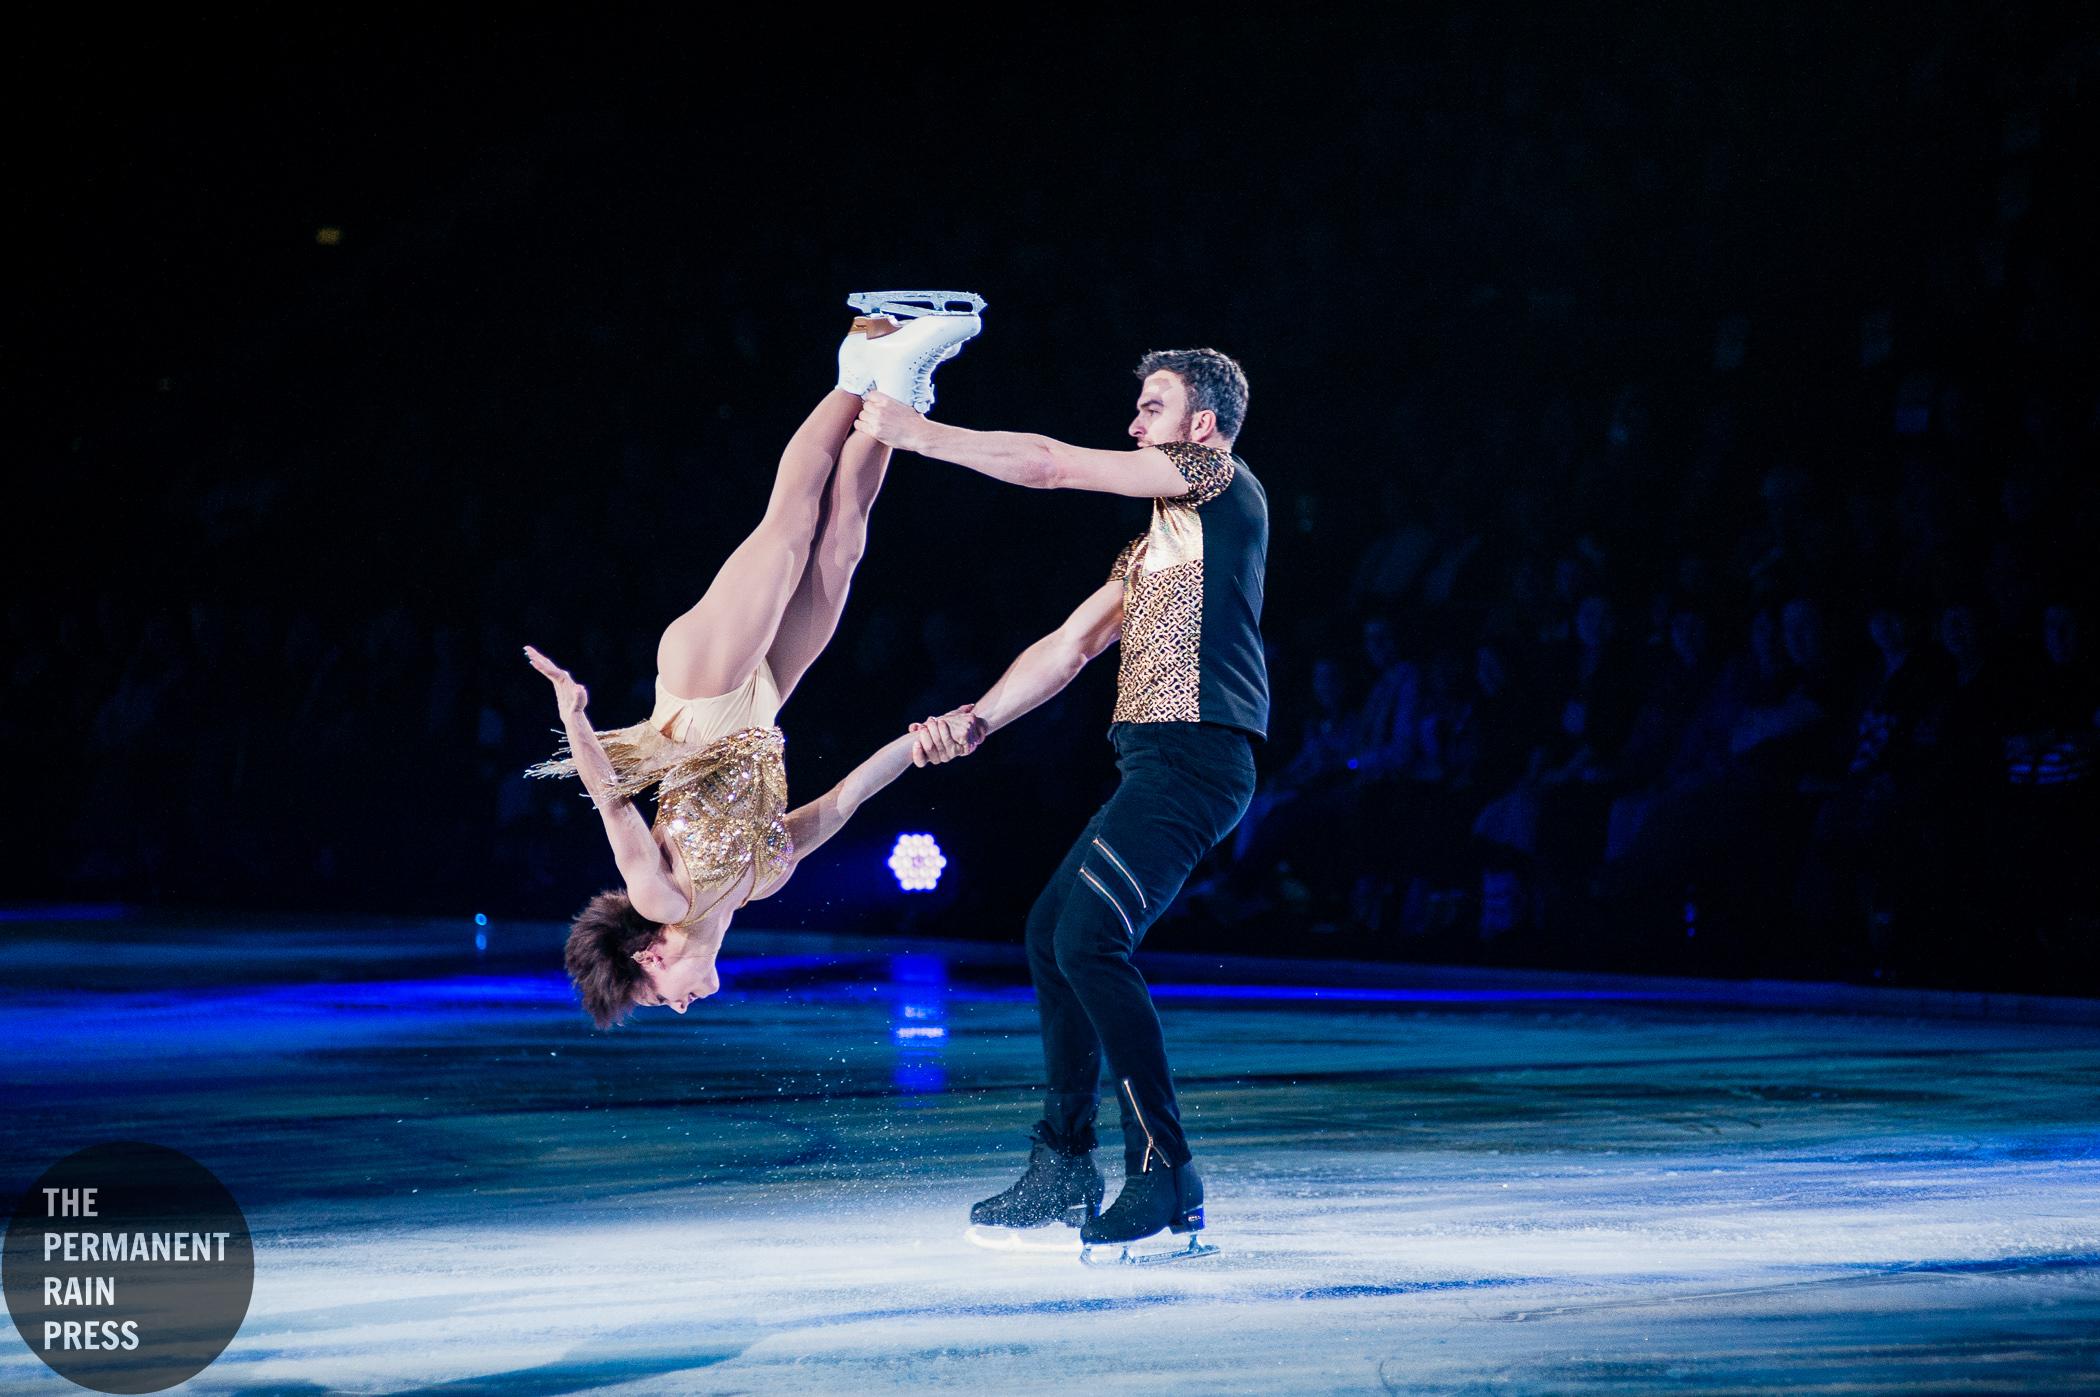 Stars_On_Ice-Rogers-Arena_Timothy_Nguyen-16.jpg